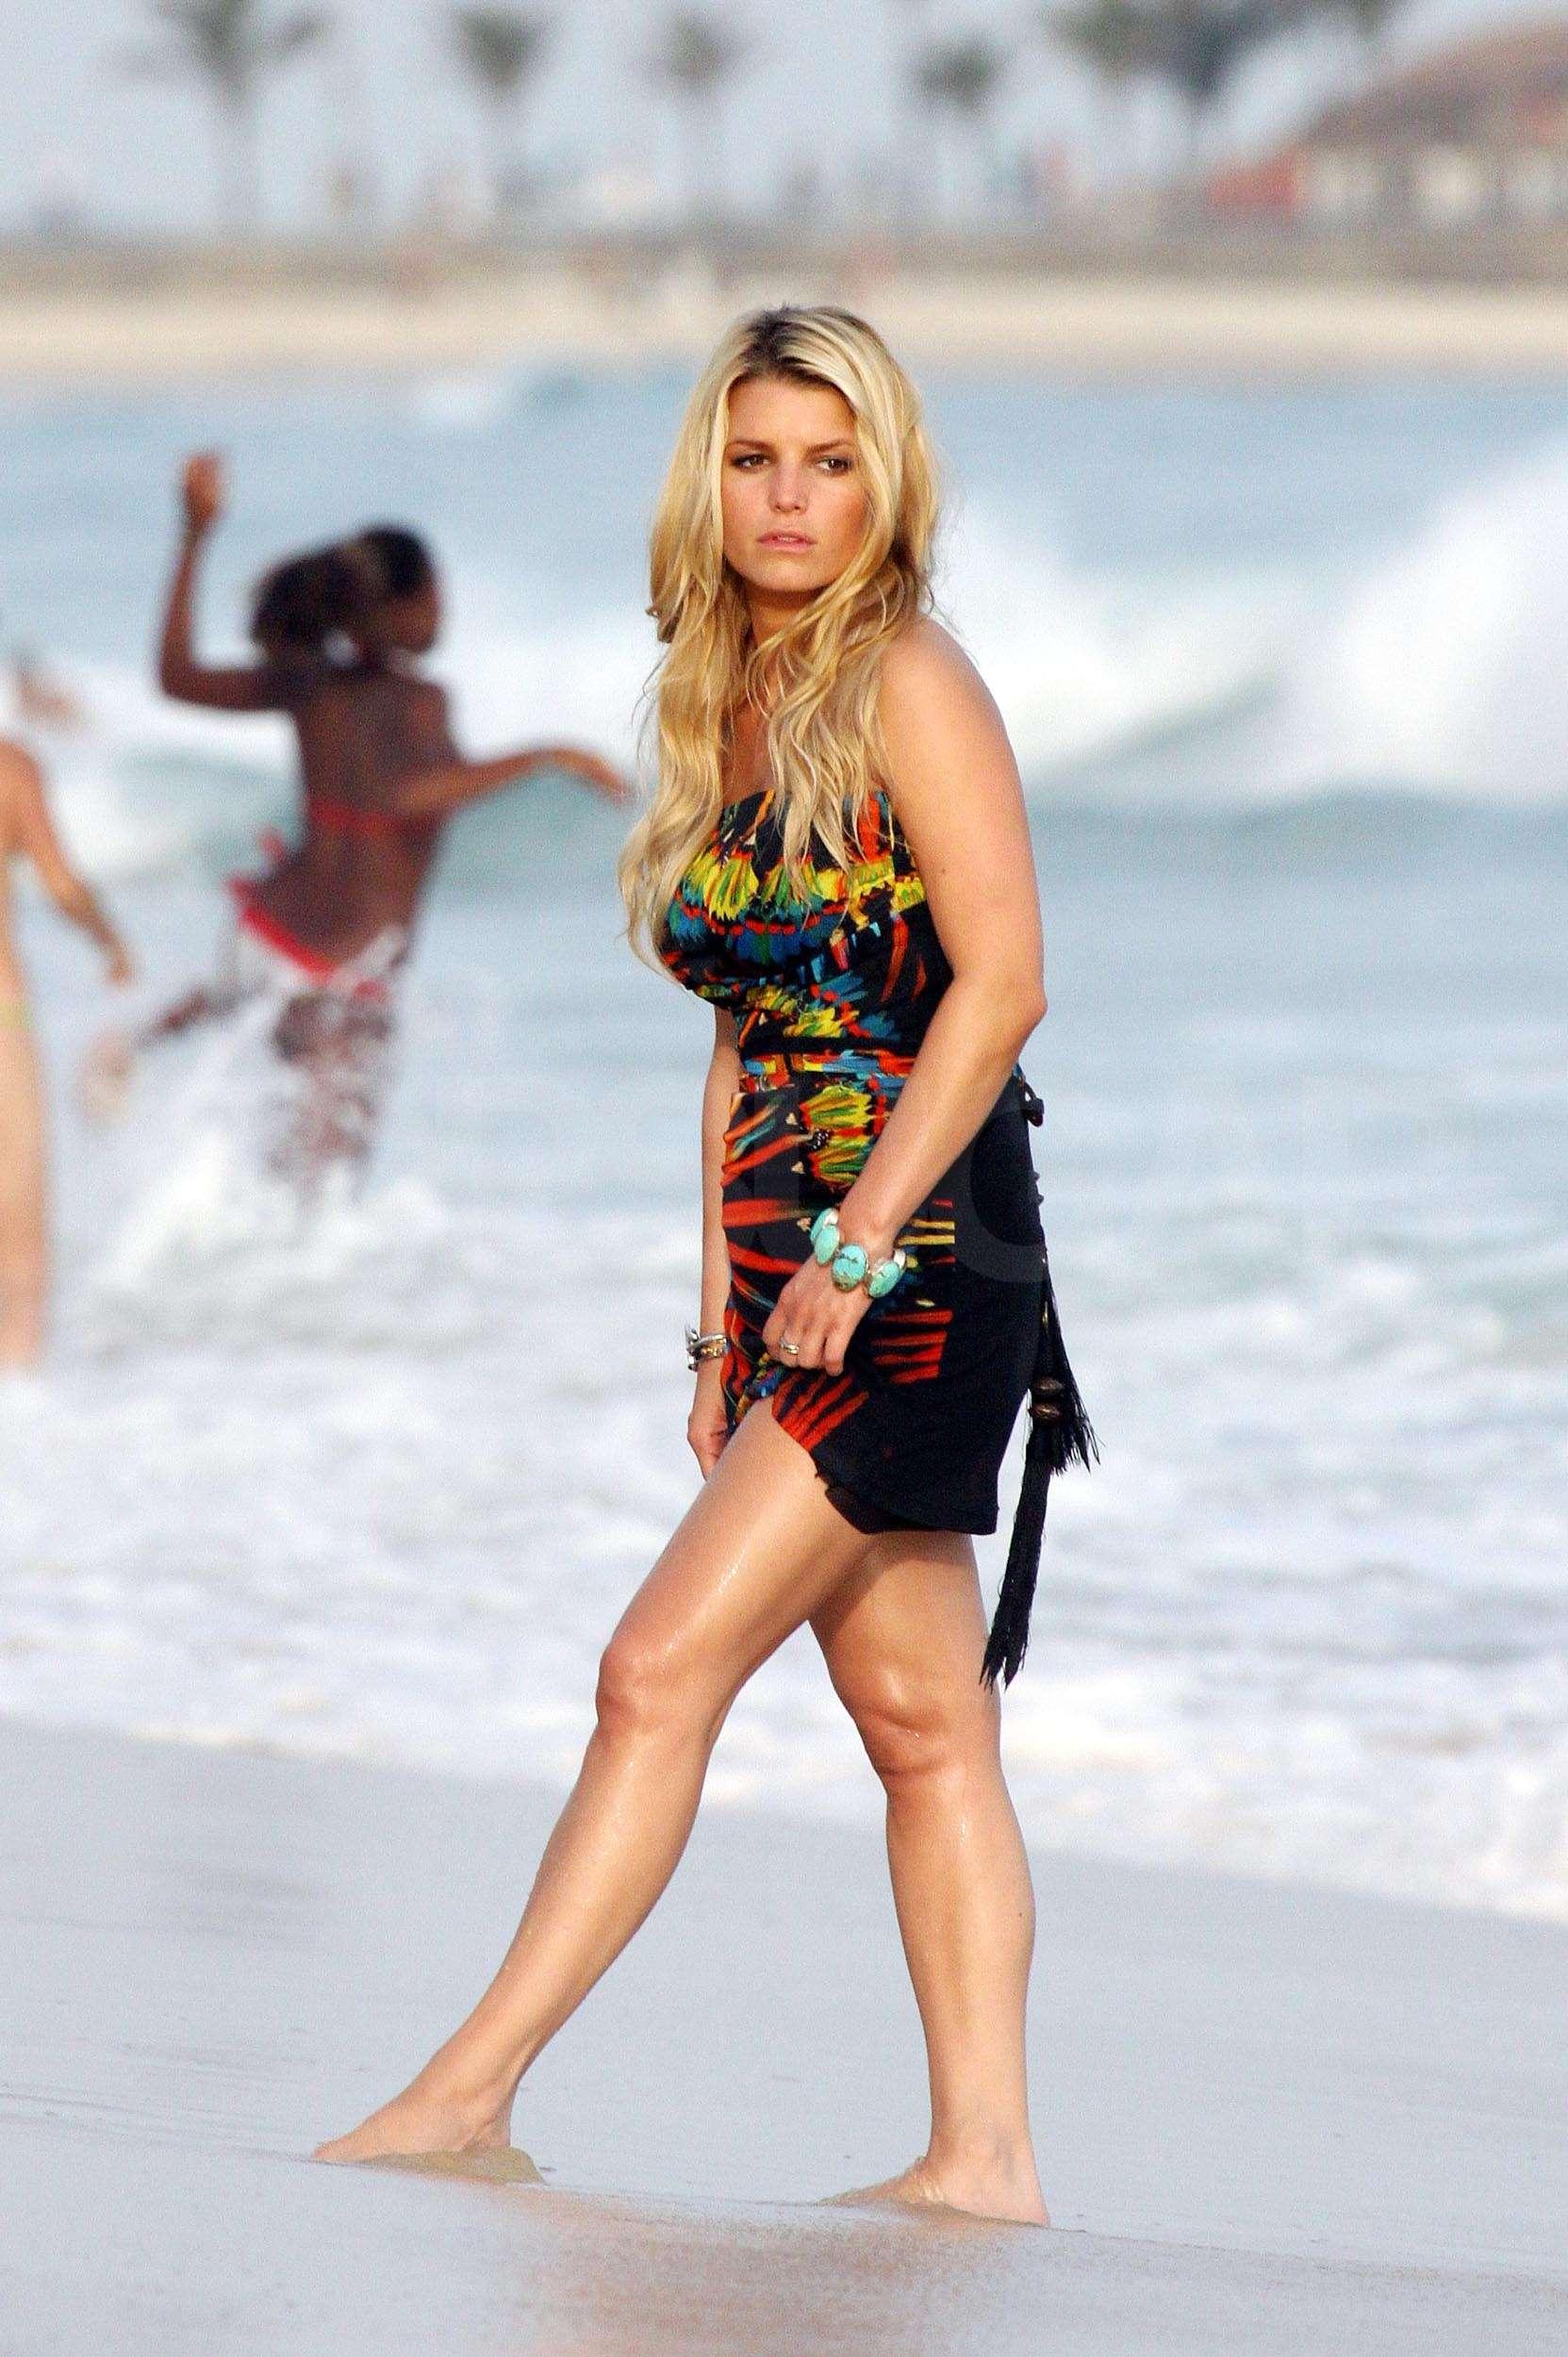 Jessica Simpson Bikini Beach Pics